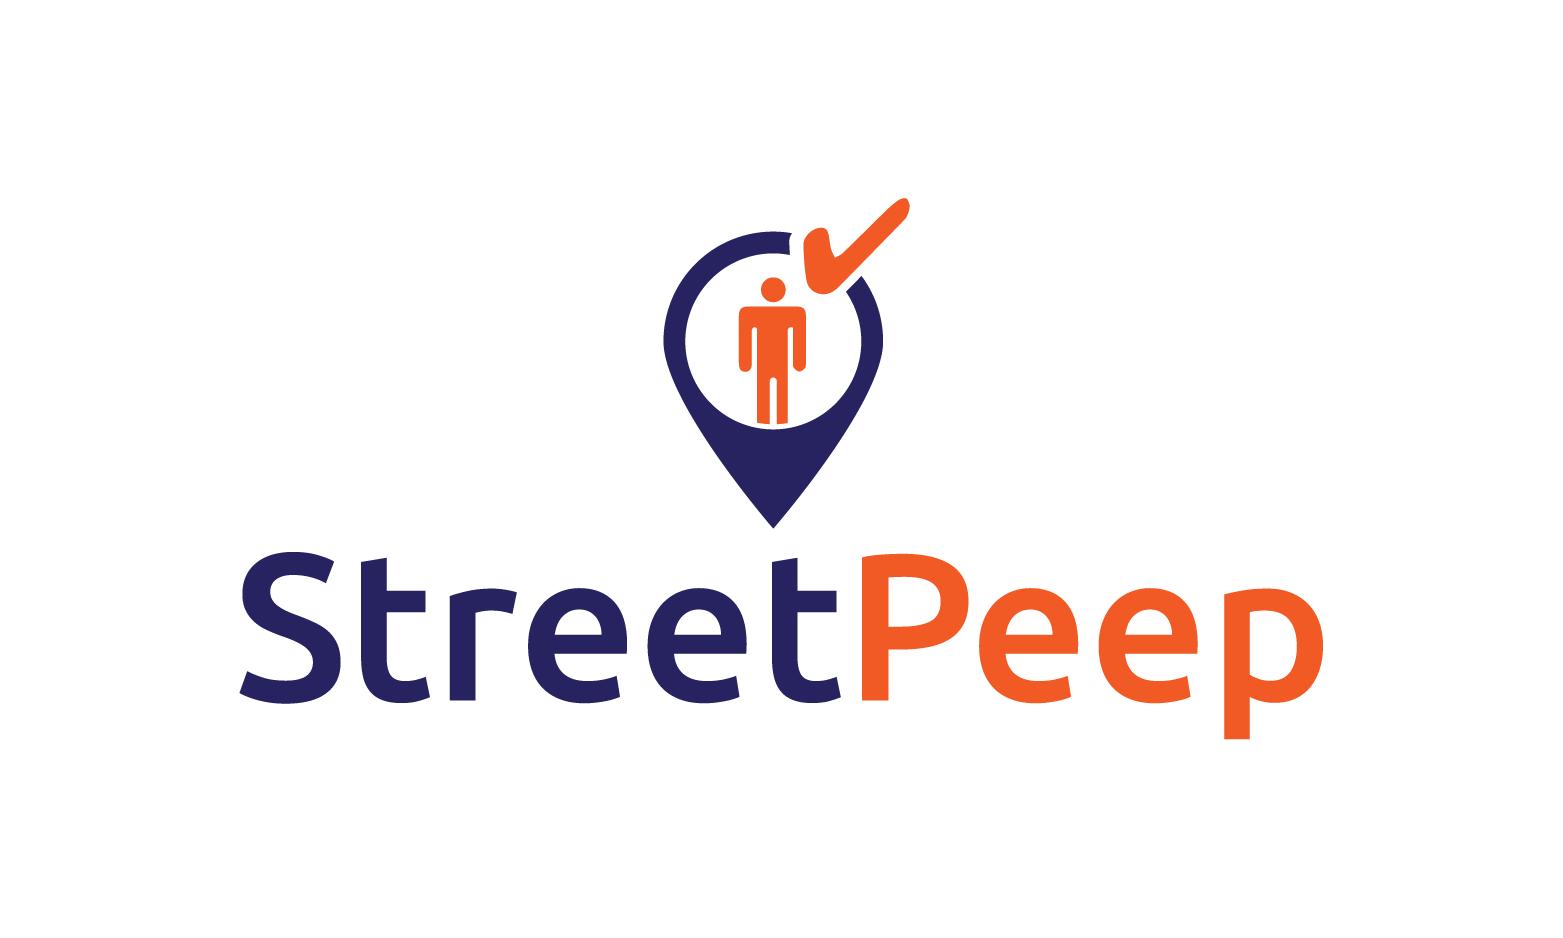 StreetPeep.com